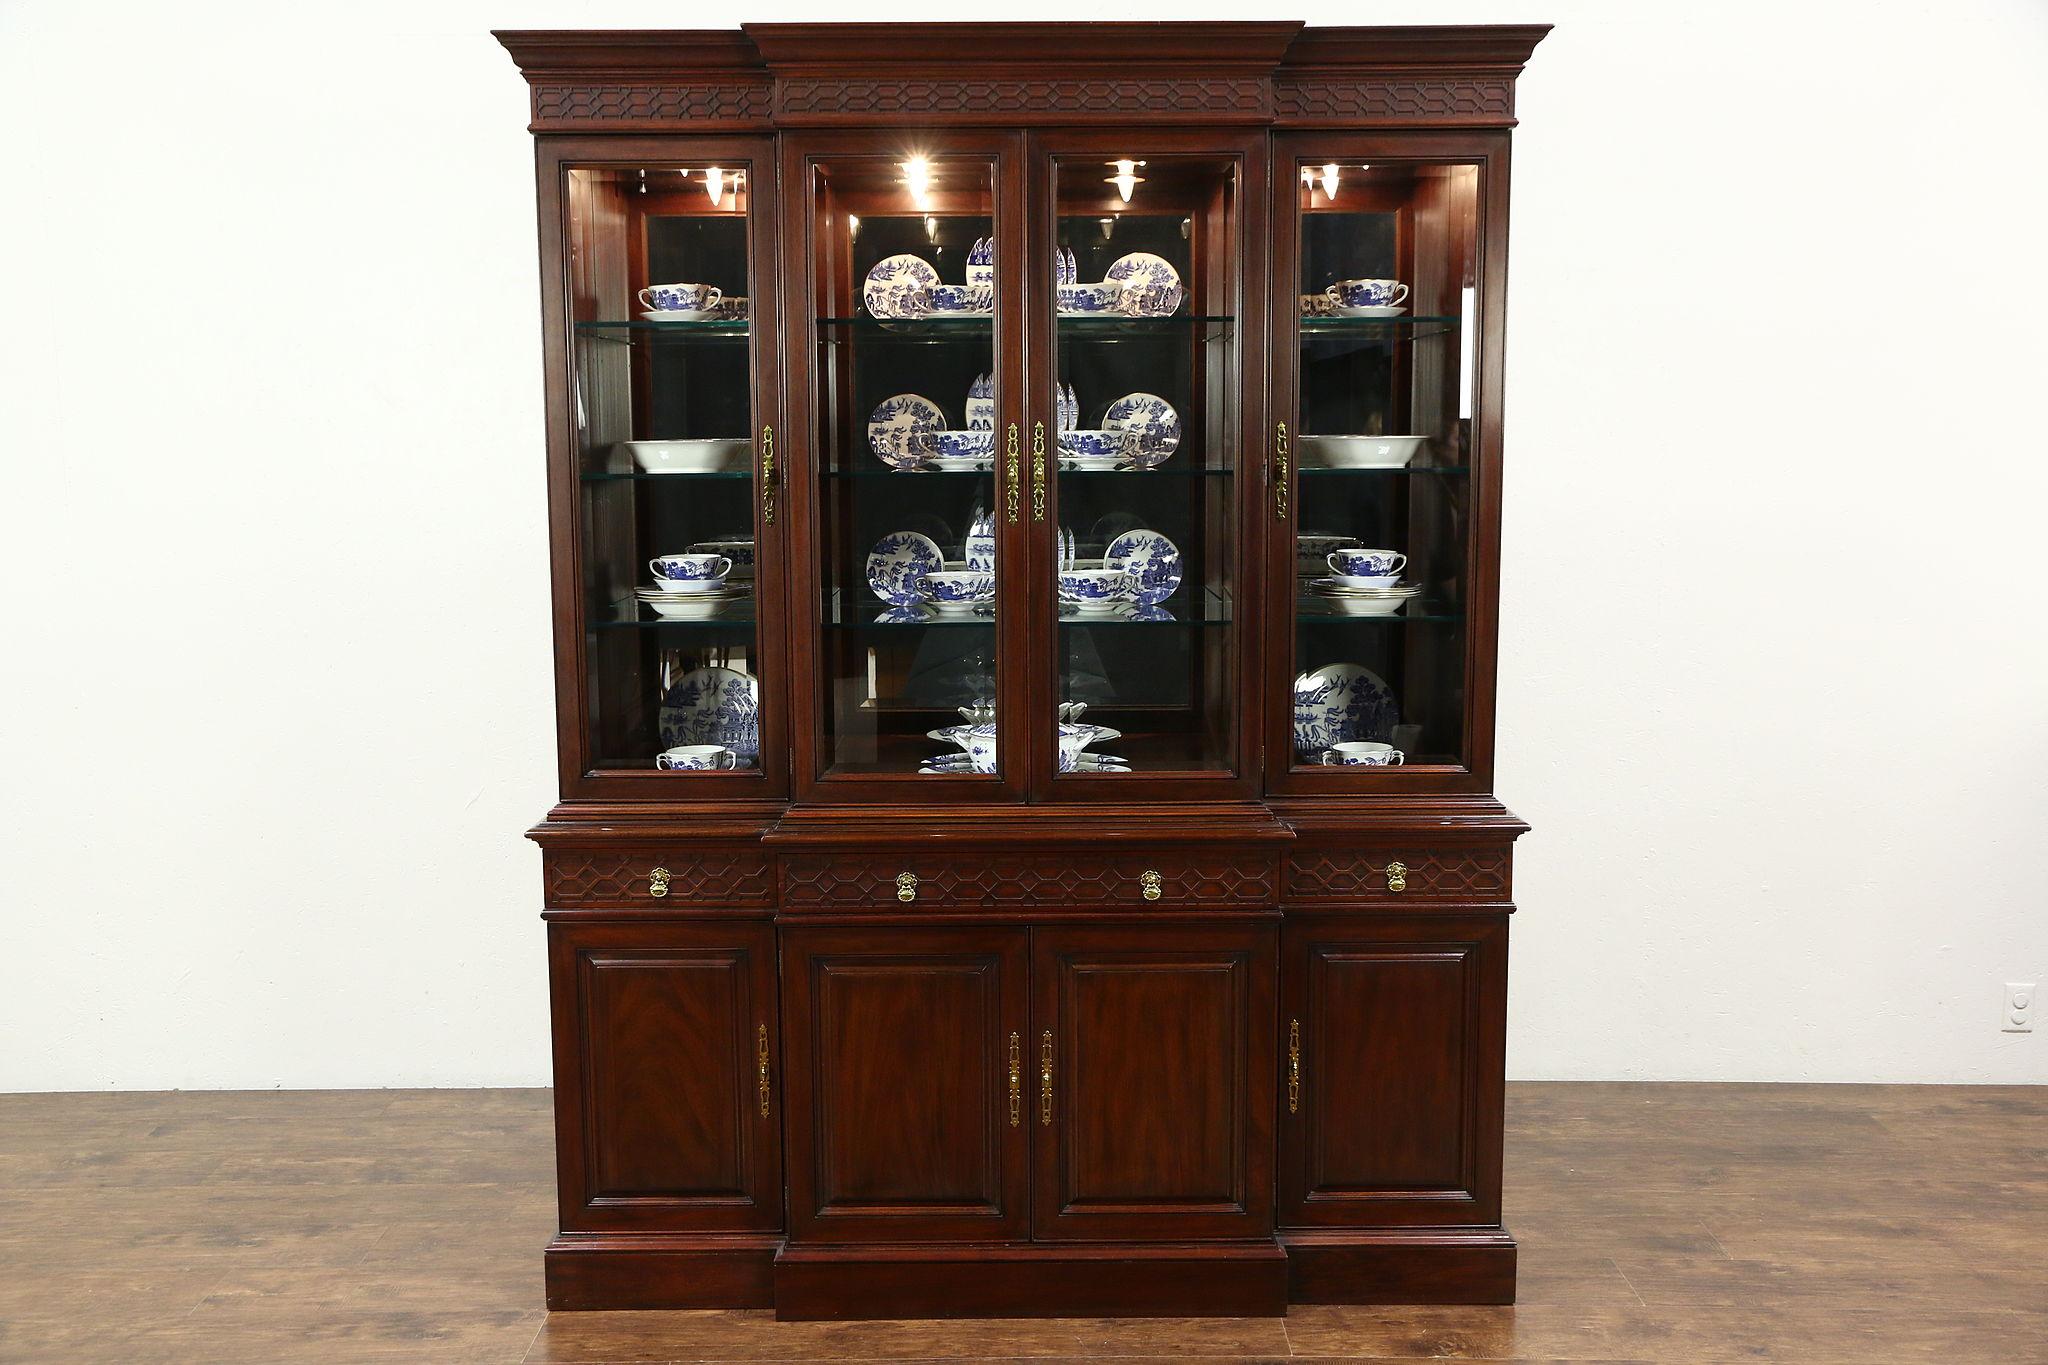 Henkel Harris Signed Mahogany Breakfront China Cabinet, Beveled Glass, 1996